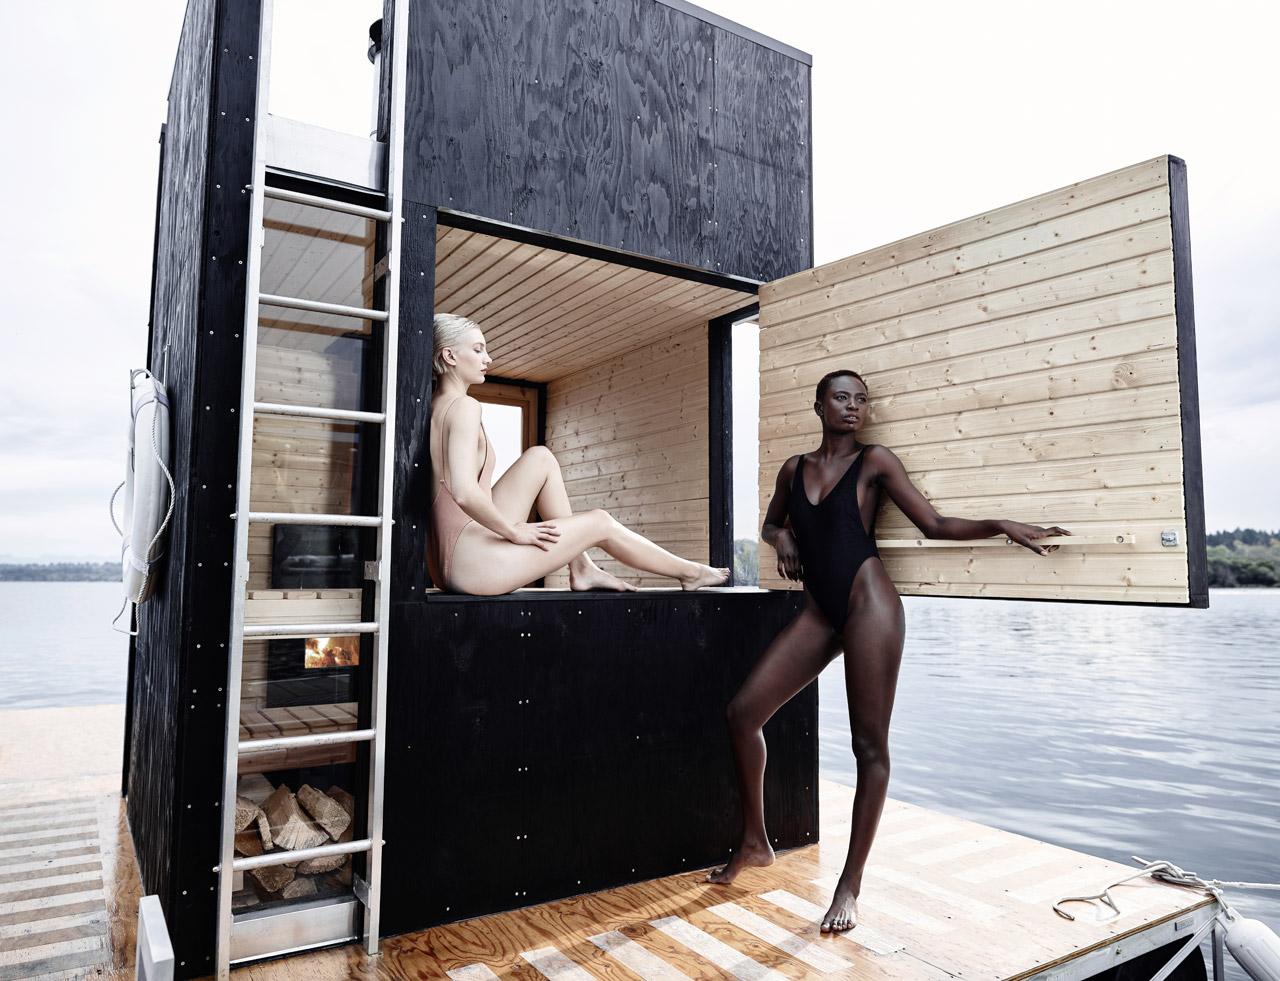 A Motor-Powered Floating Sauna by goCstudio